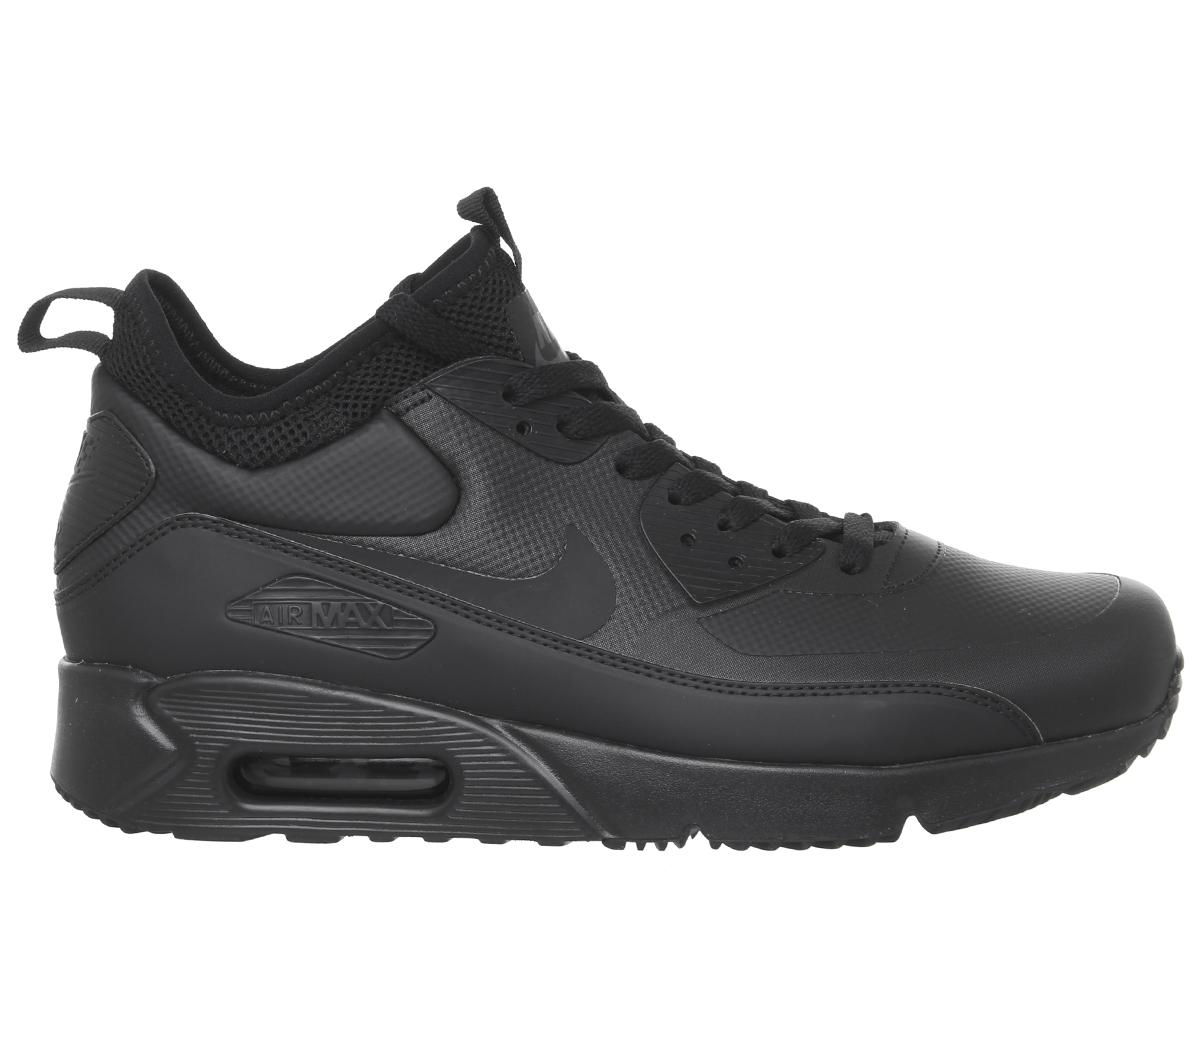 d285ff6f9e0 Nike - Black Air Max 90 Mid Wntr Te for Men - Lyst. View fullscreen